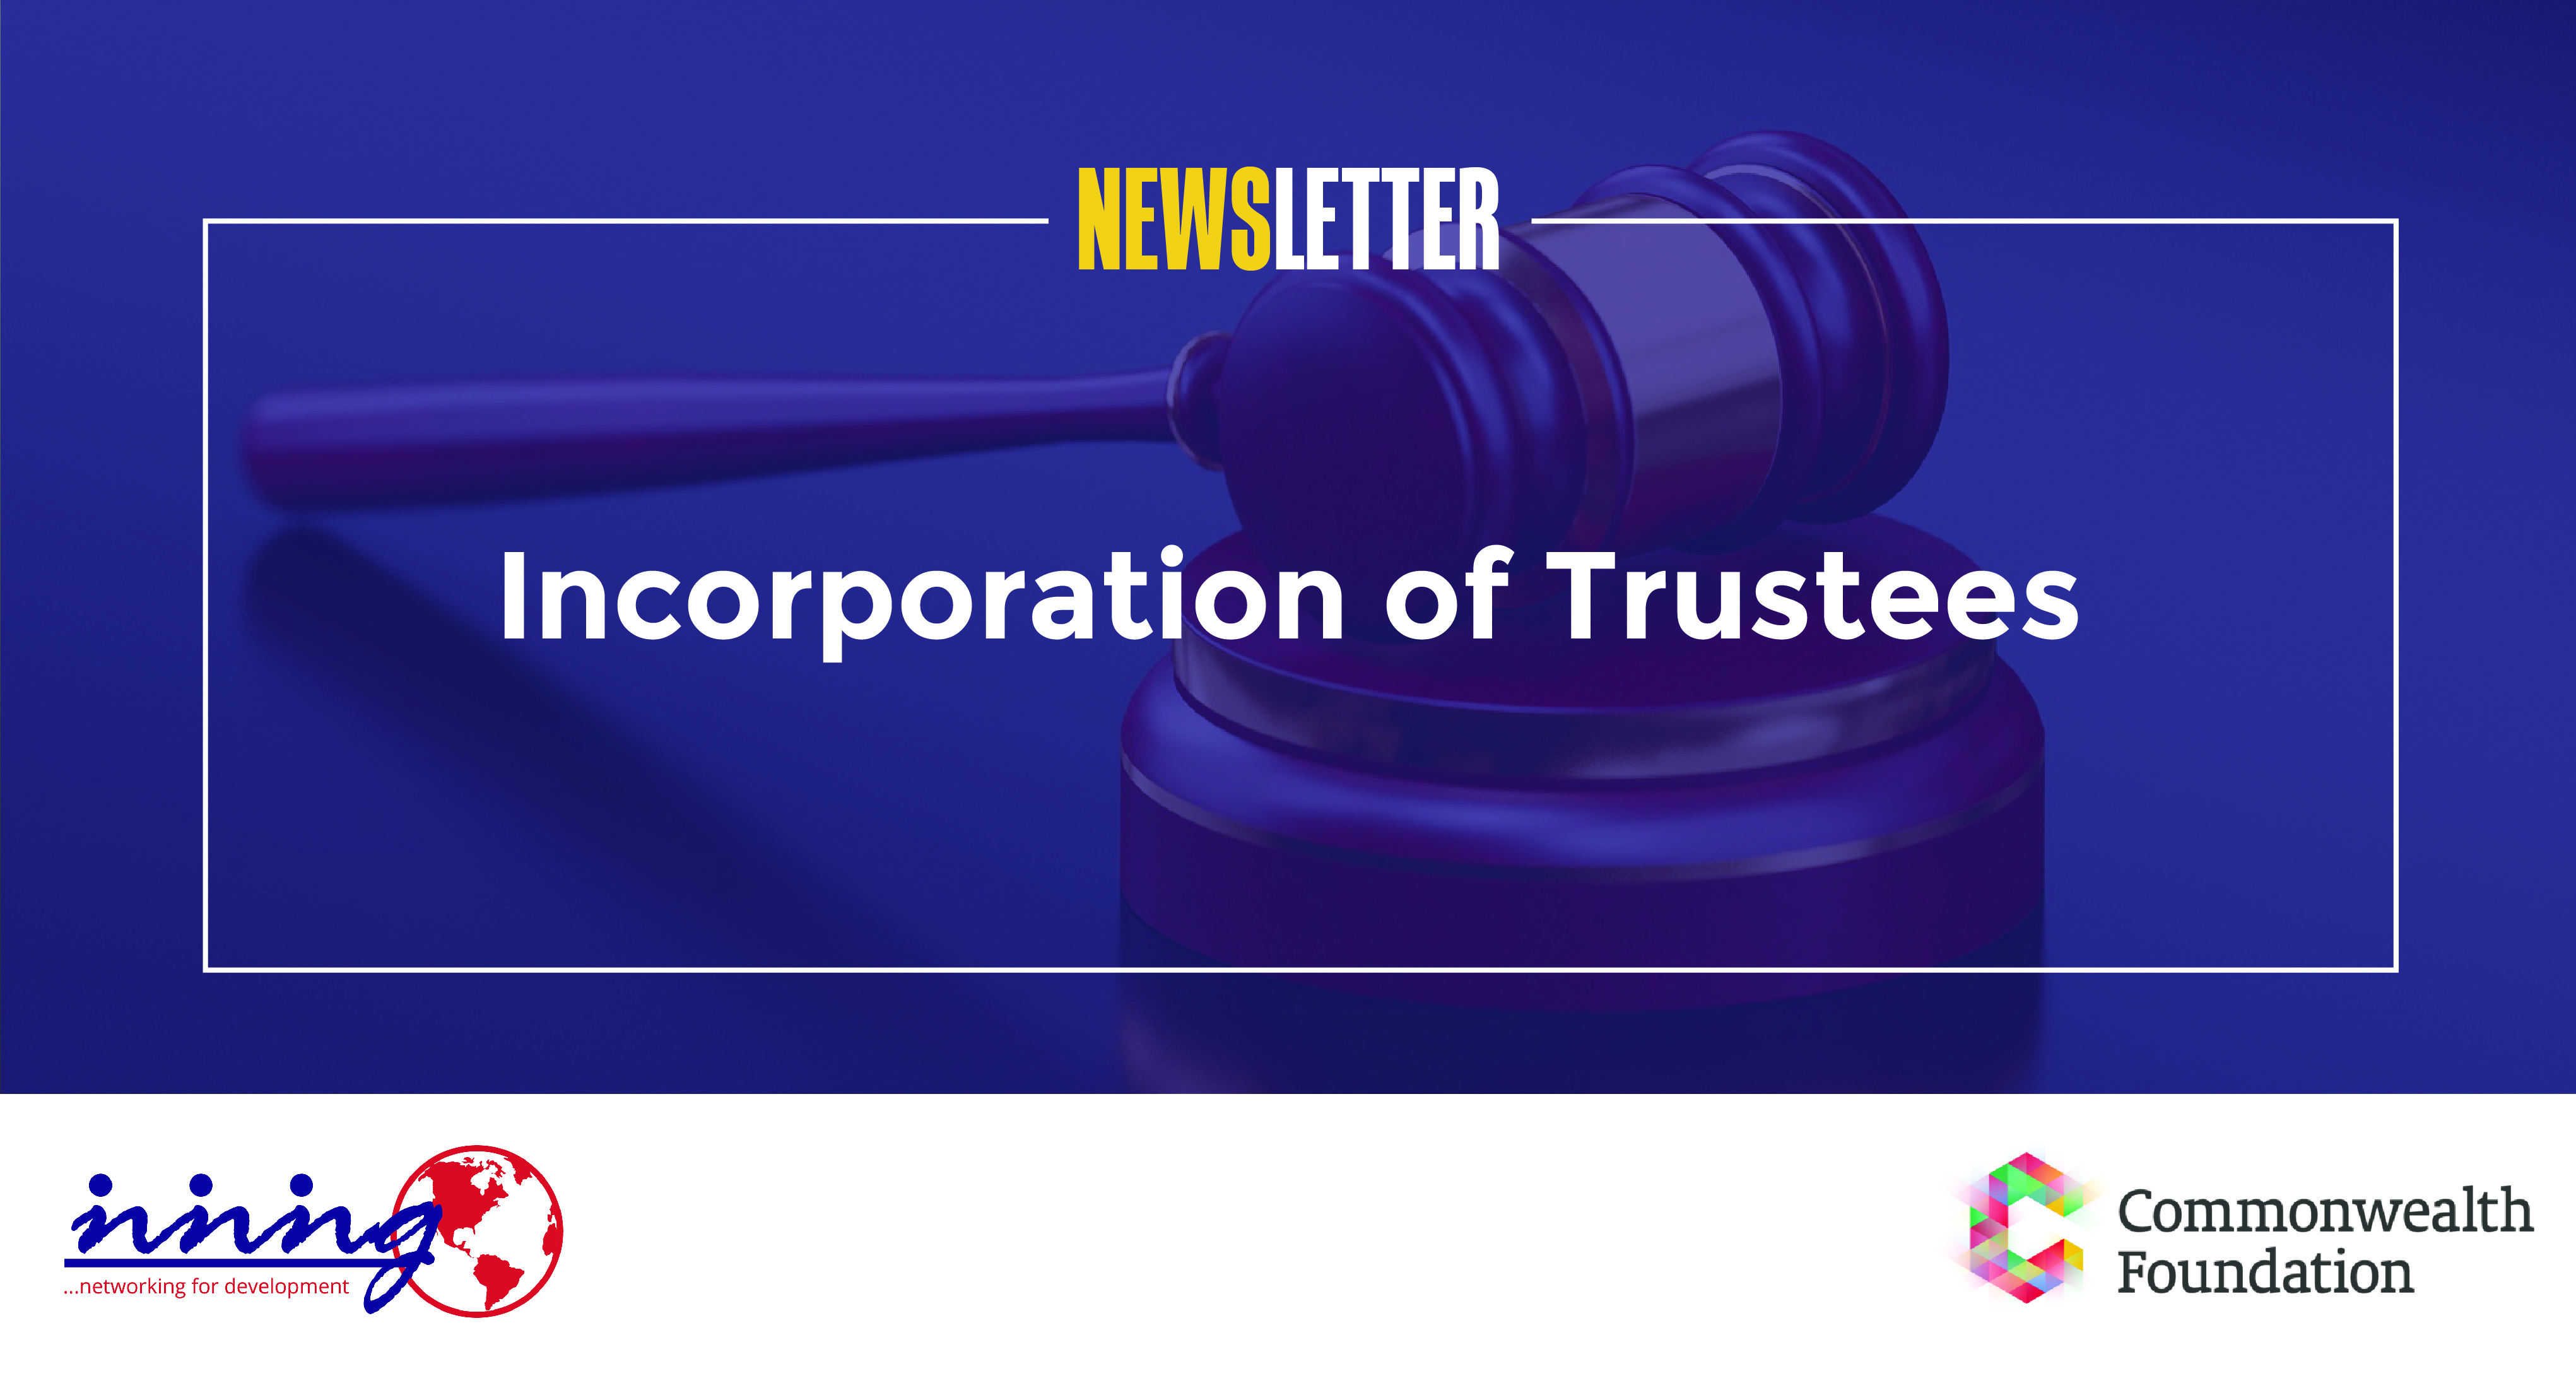 Incorporation of Trustees (February, 2019)